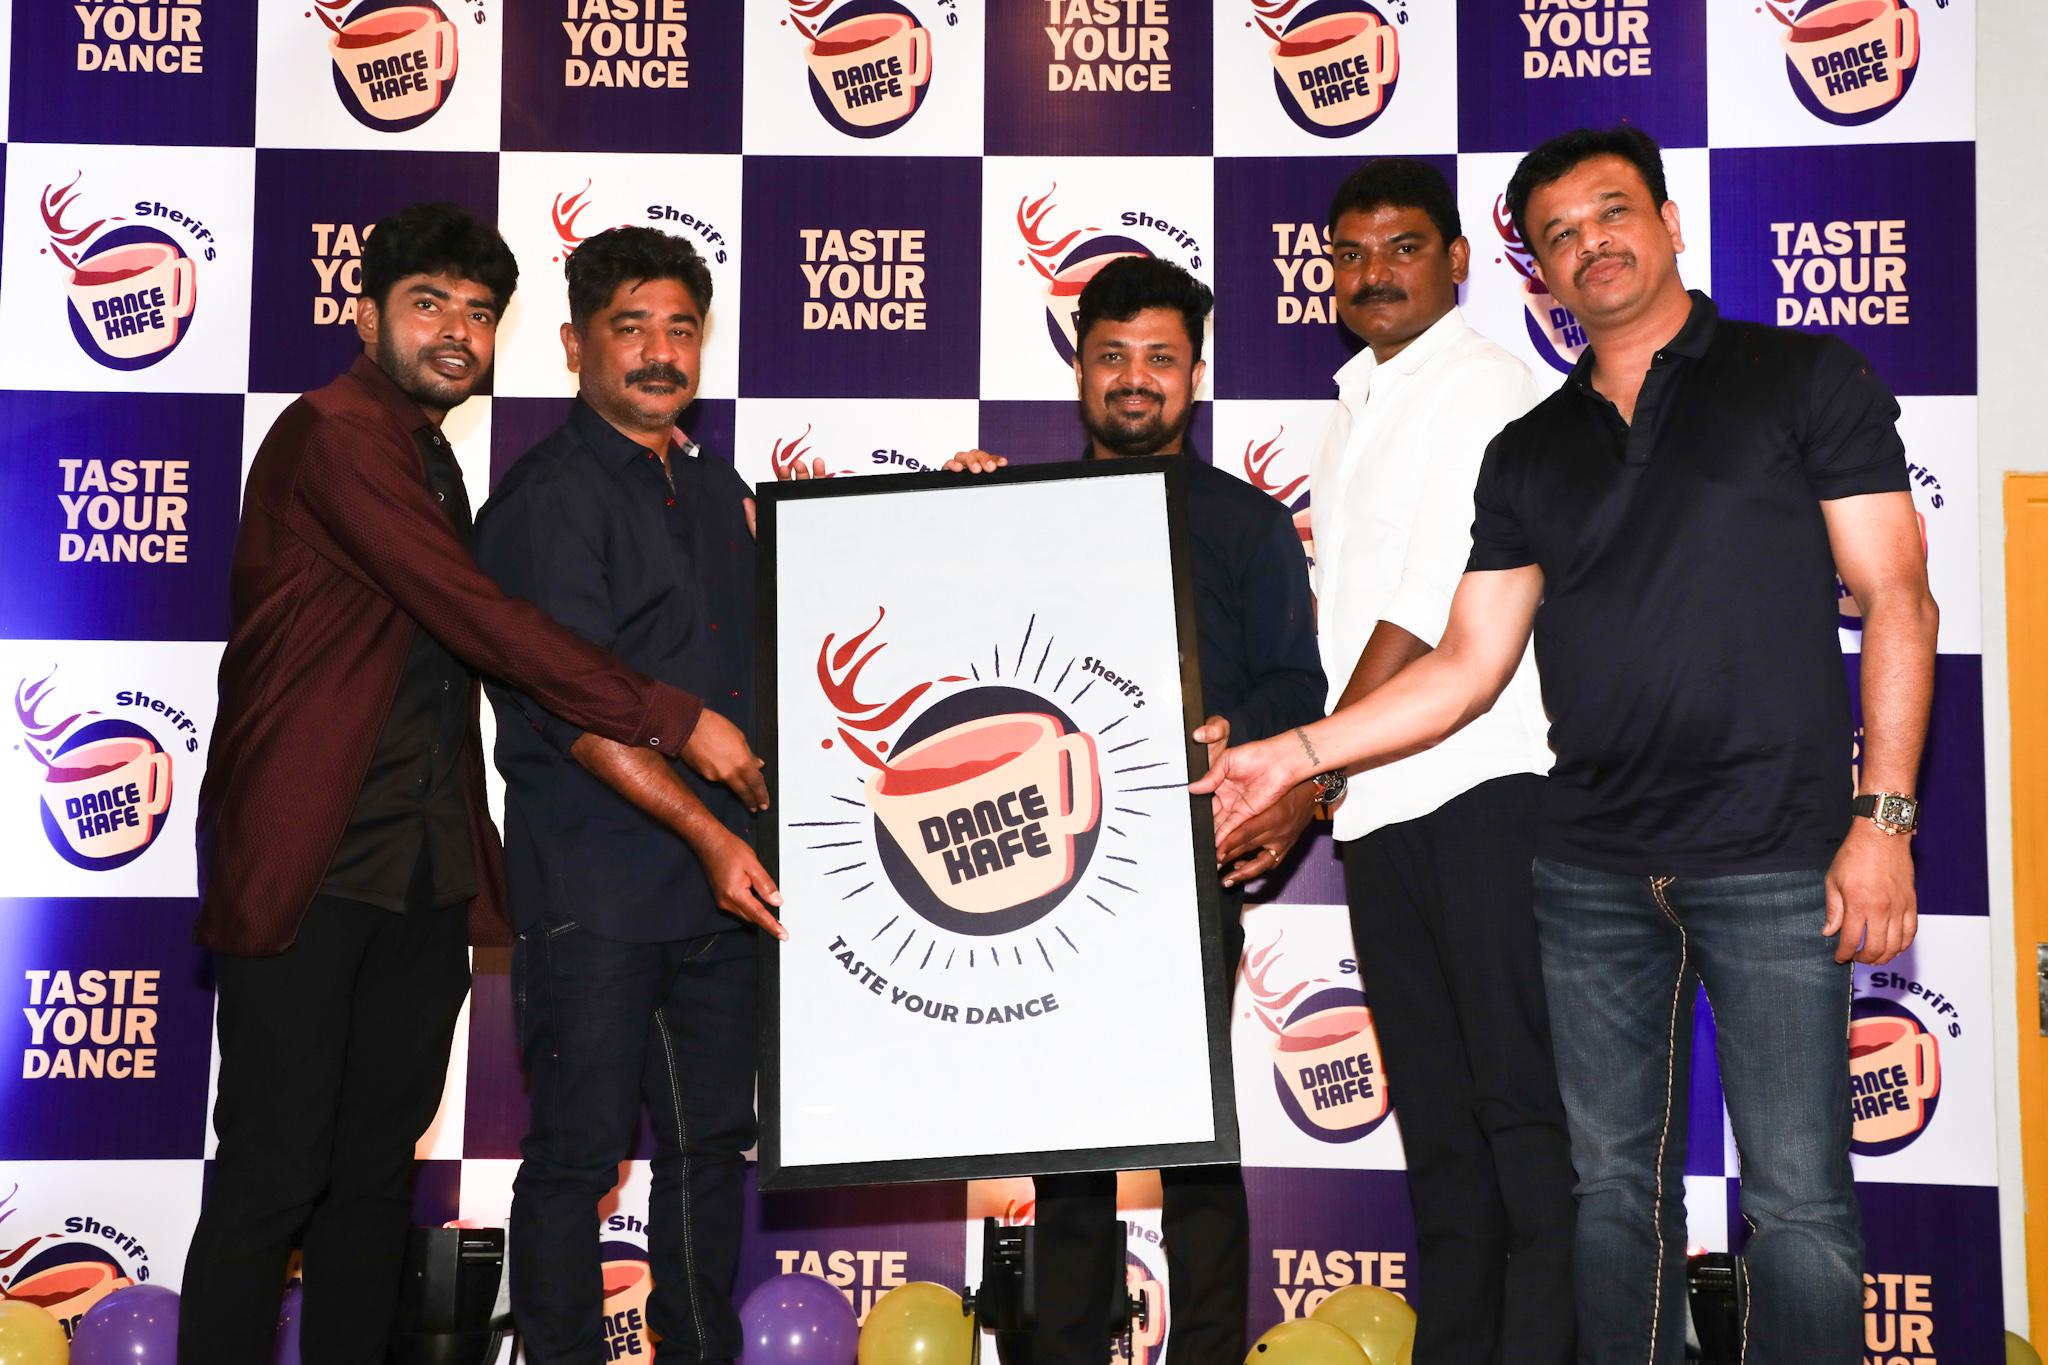 Dance Kafe INAUGURATED By RAJUSUNDARAM Master |  Tamil Movie News | Cinema Profile